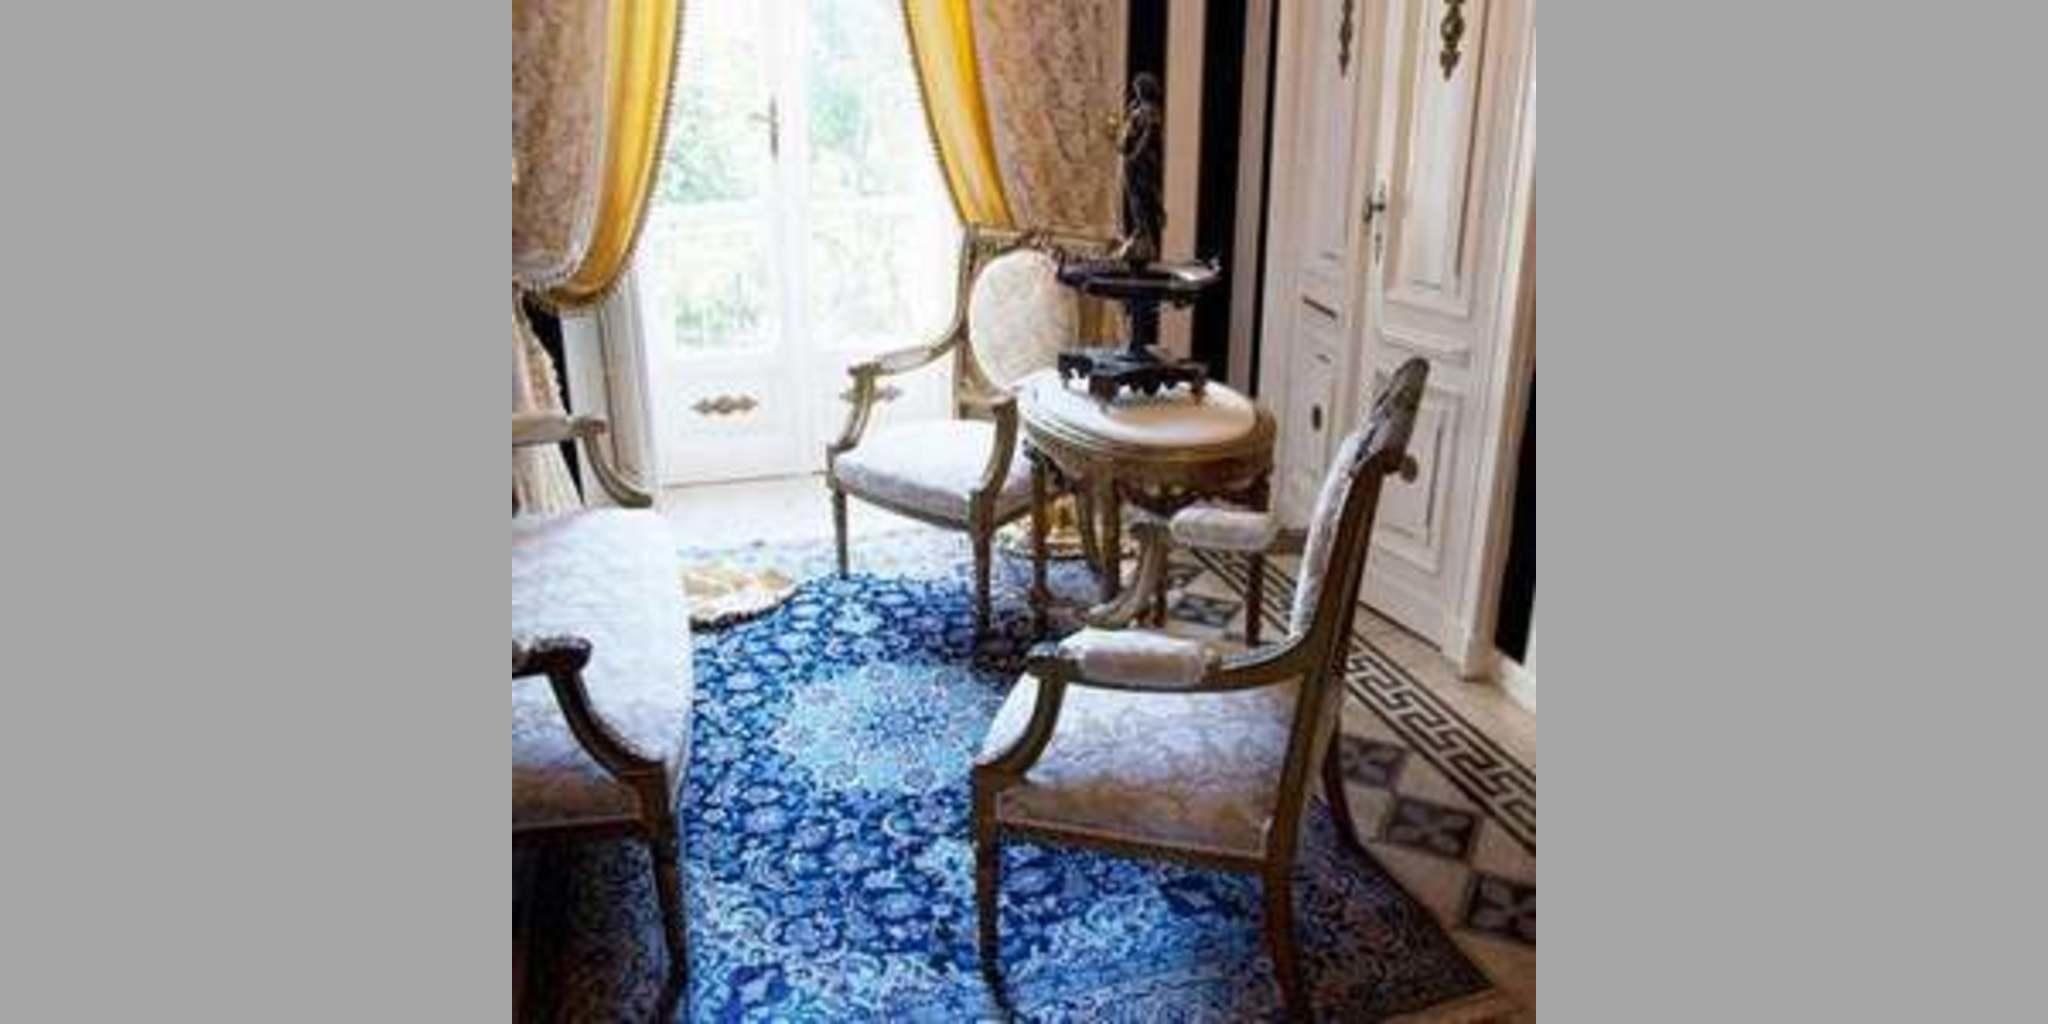 Bed & Breakfast Torino - Elegante A Cit Turin